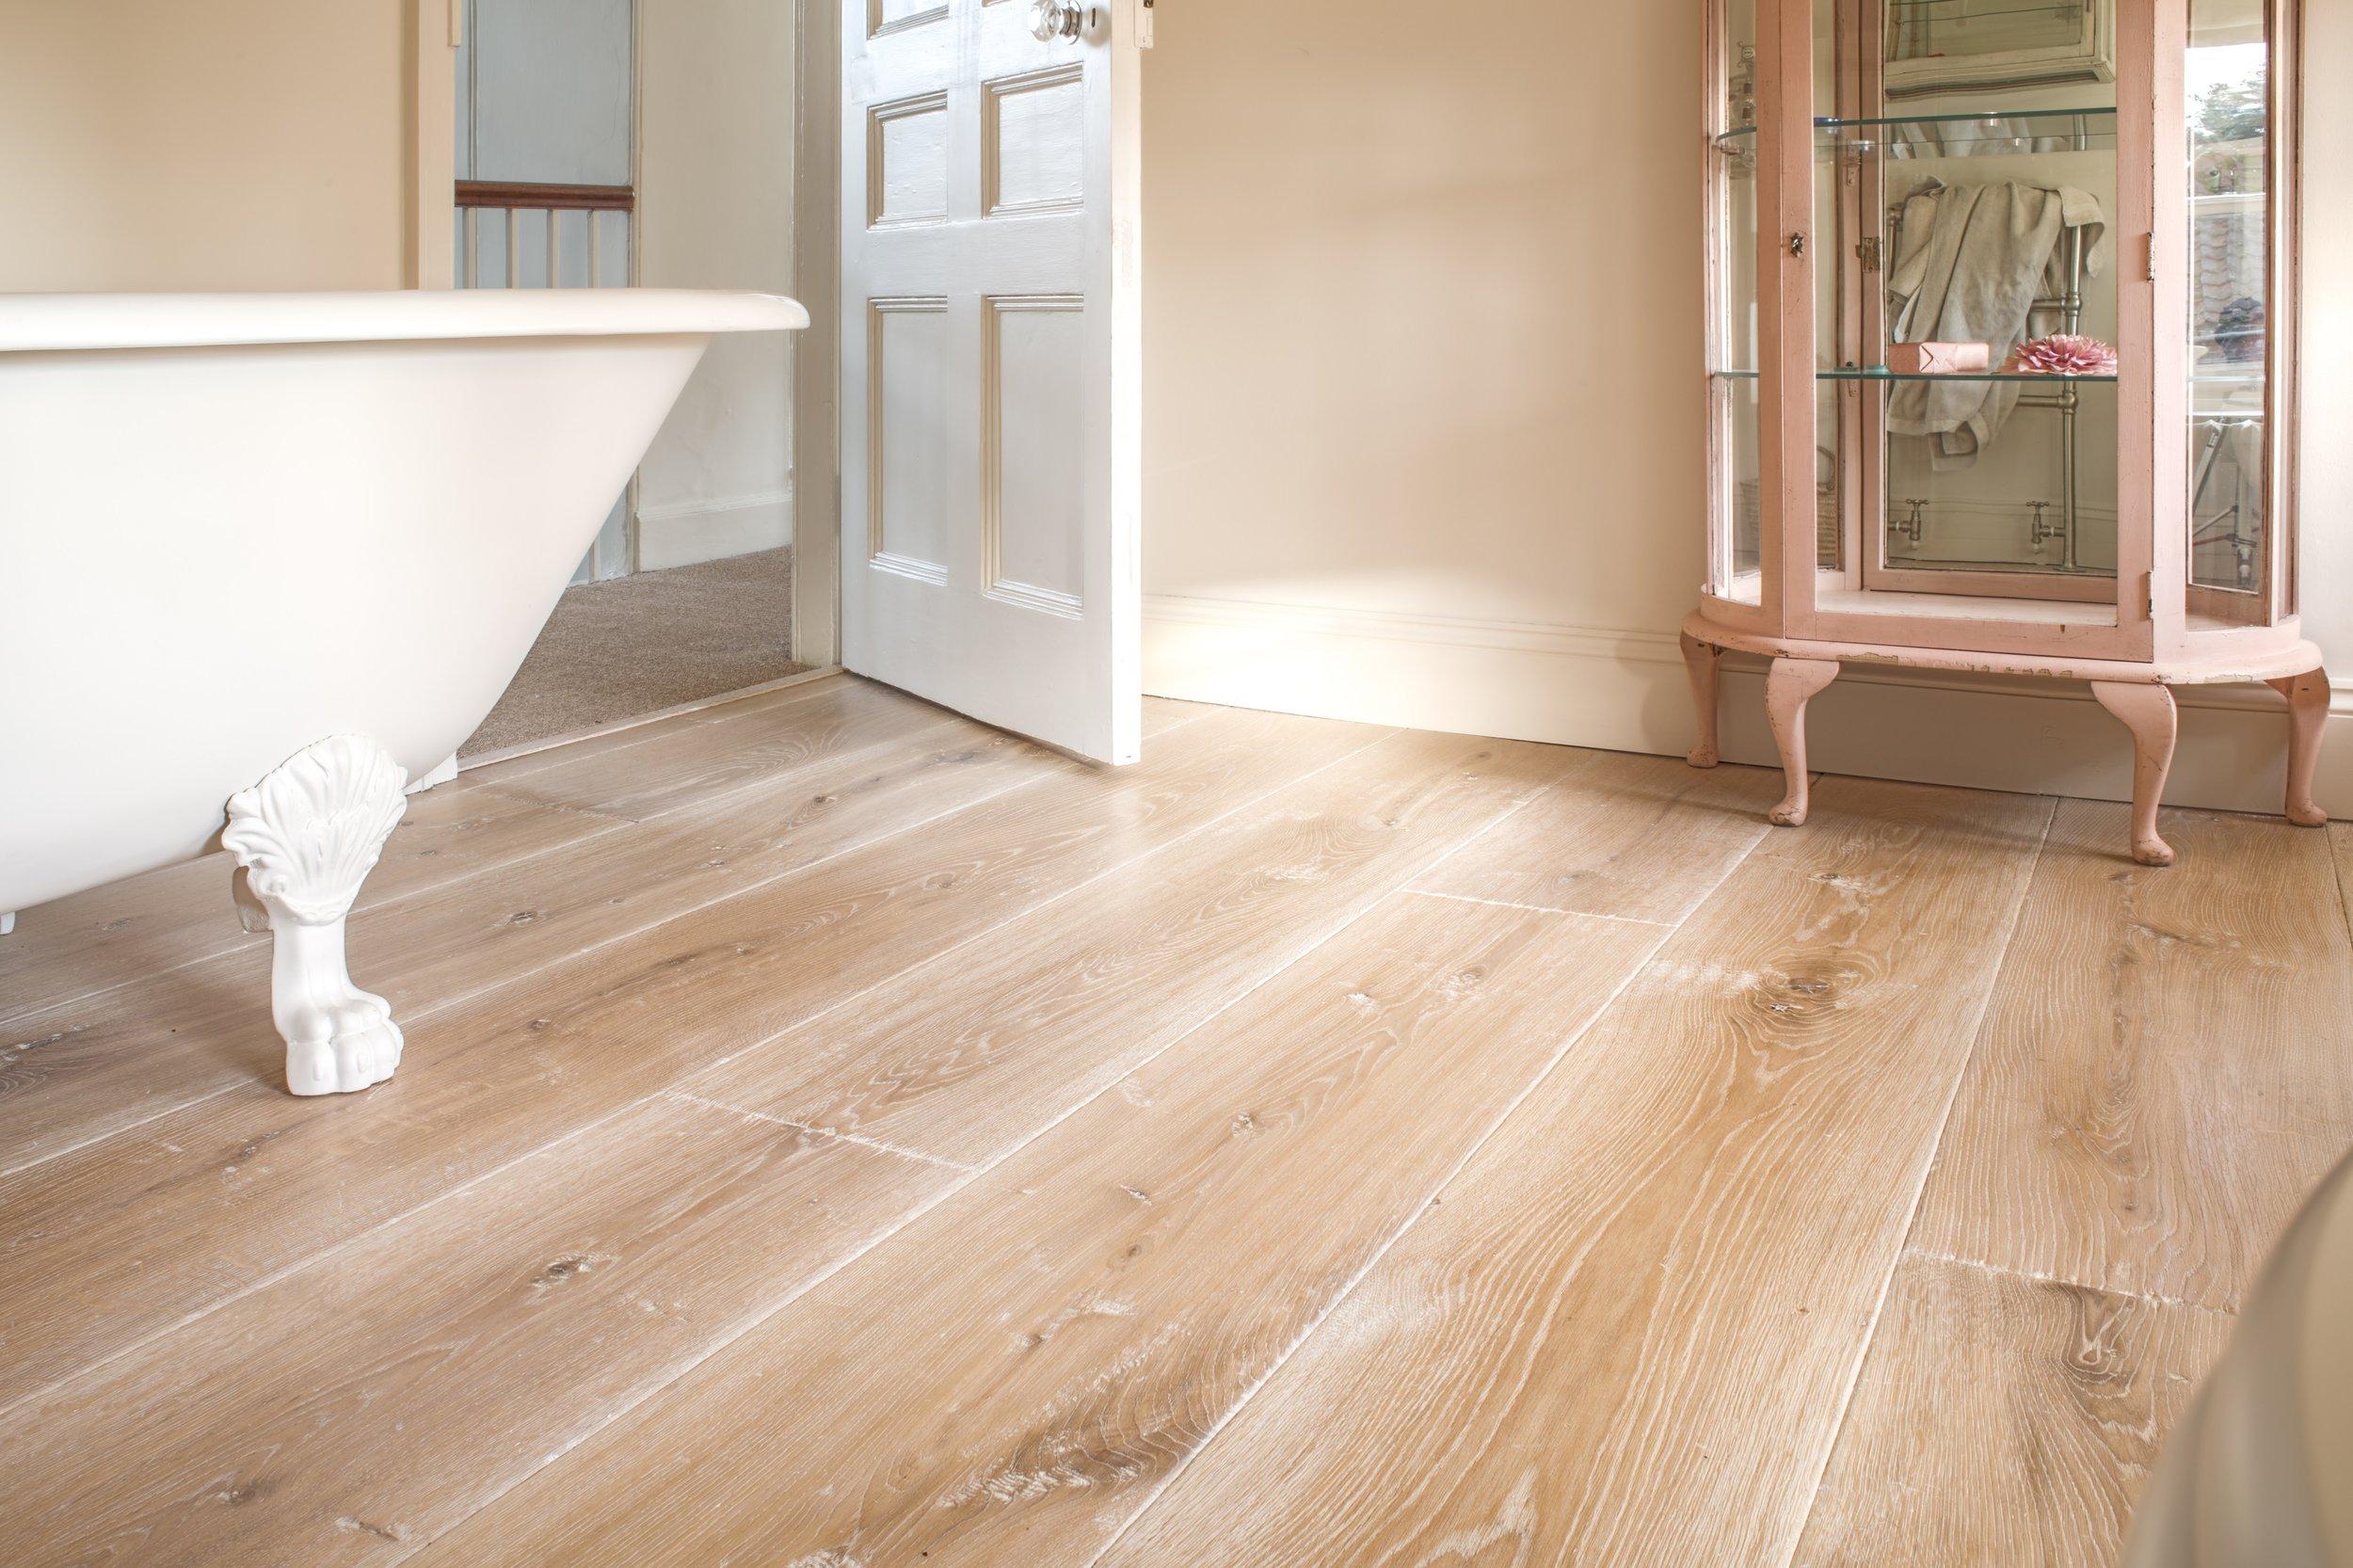 Wood floor in bathroom